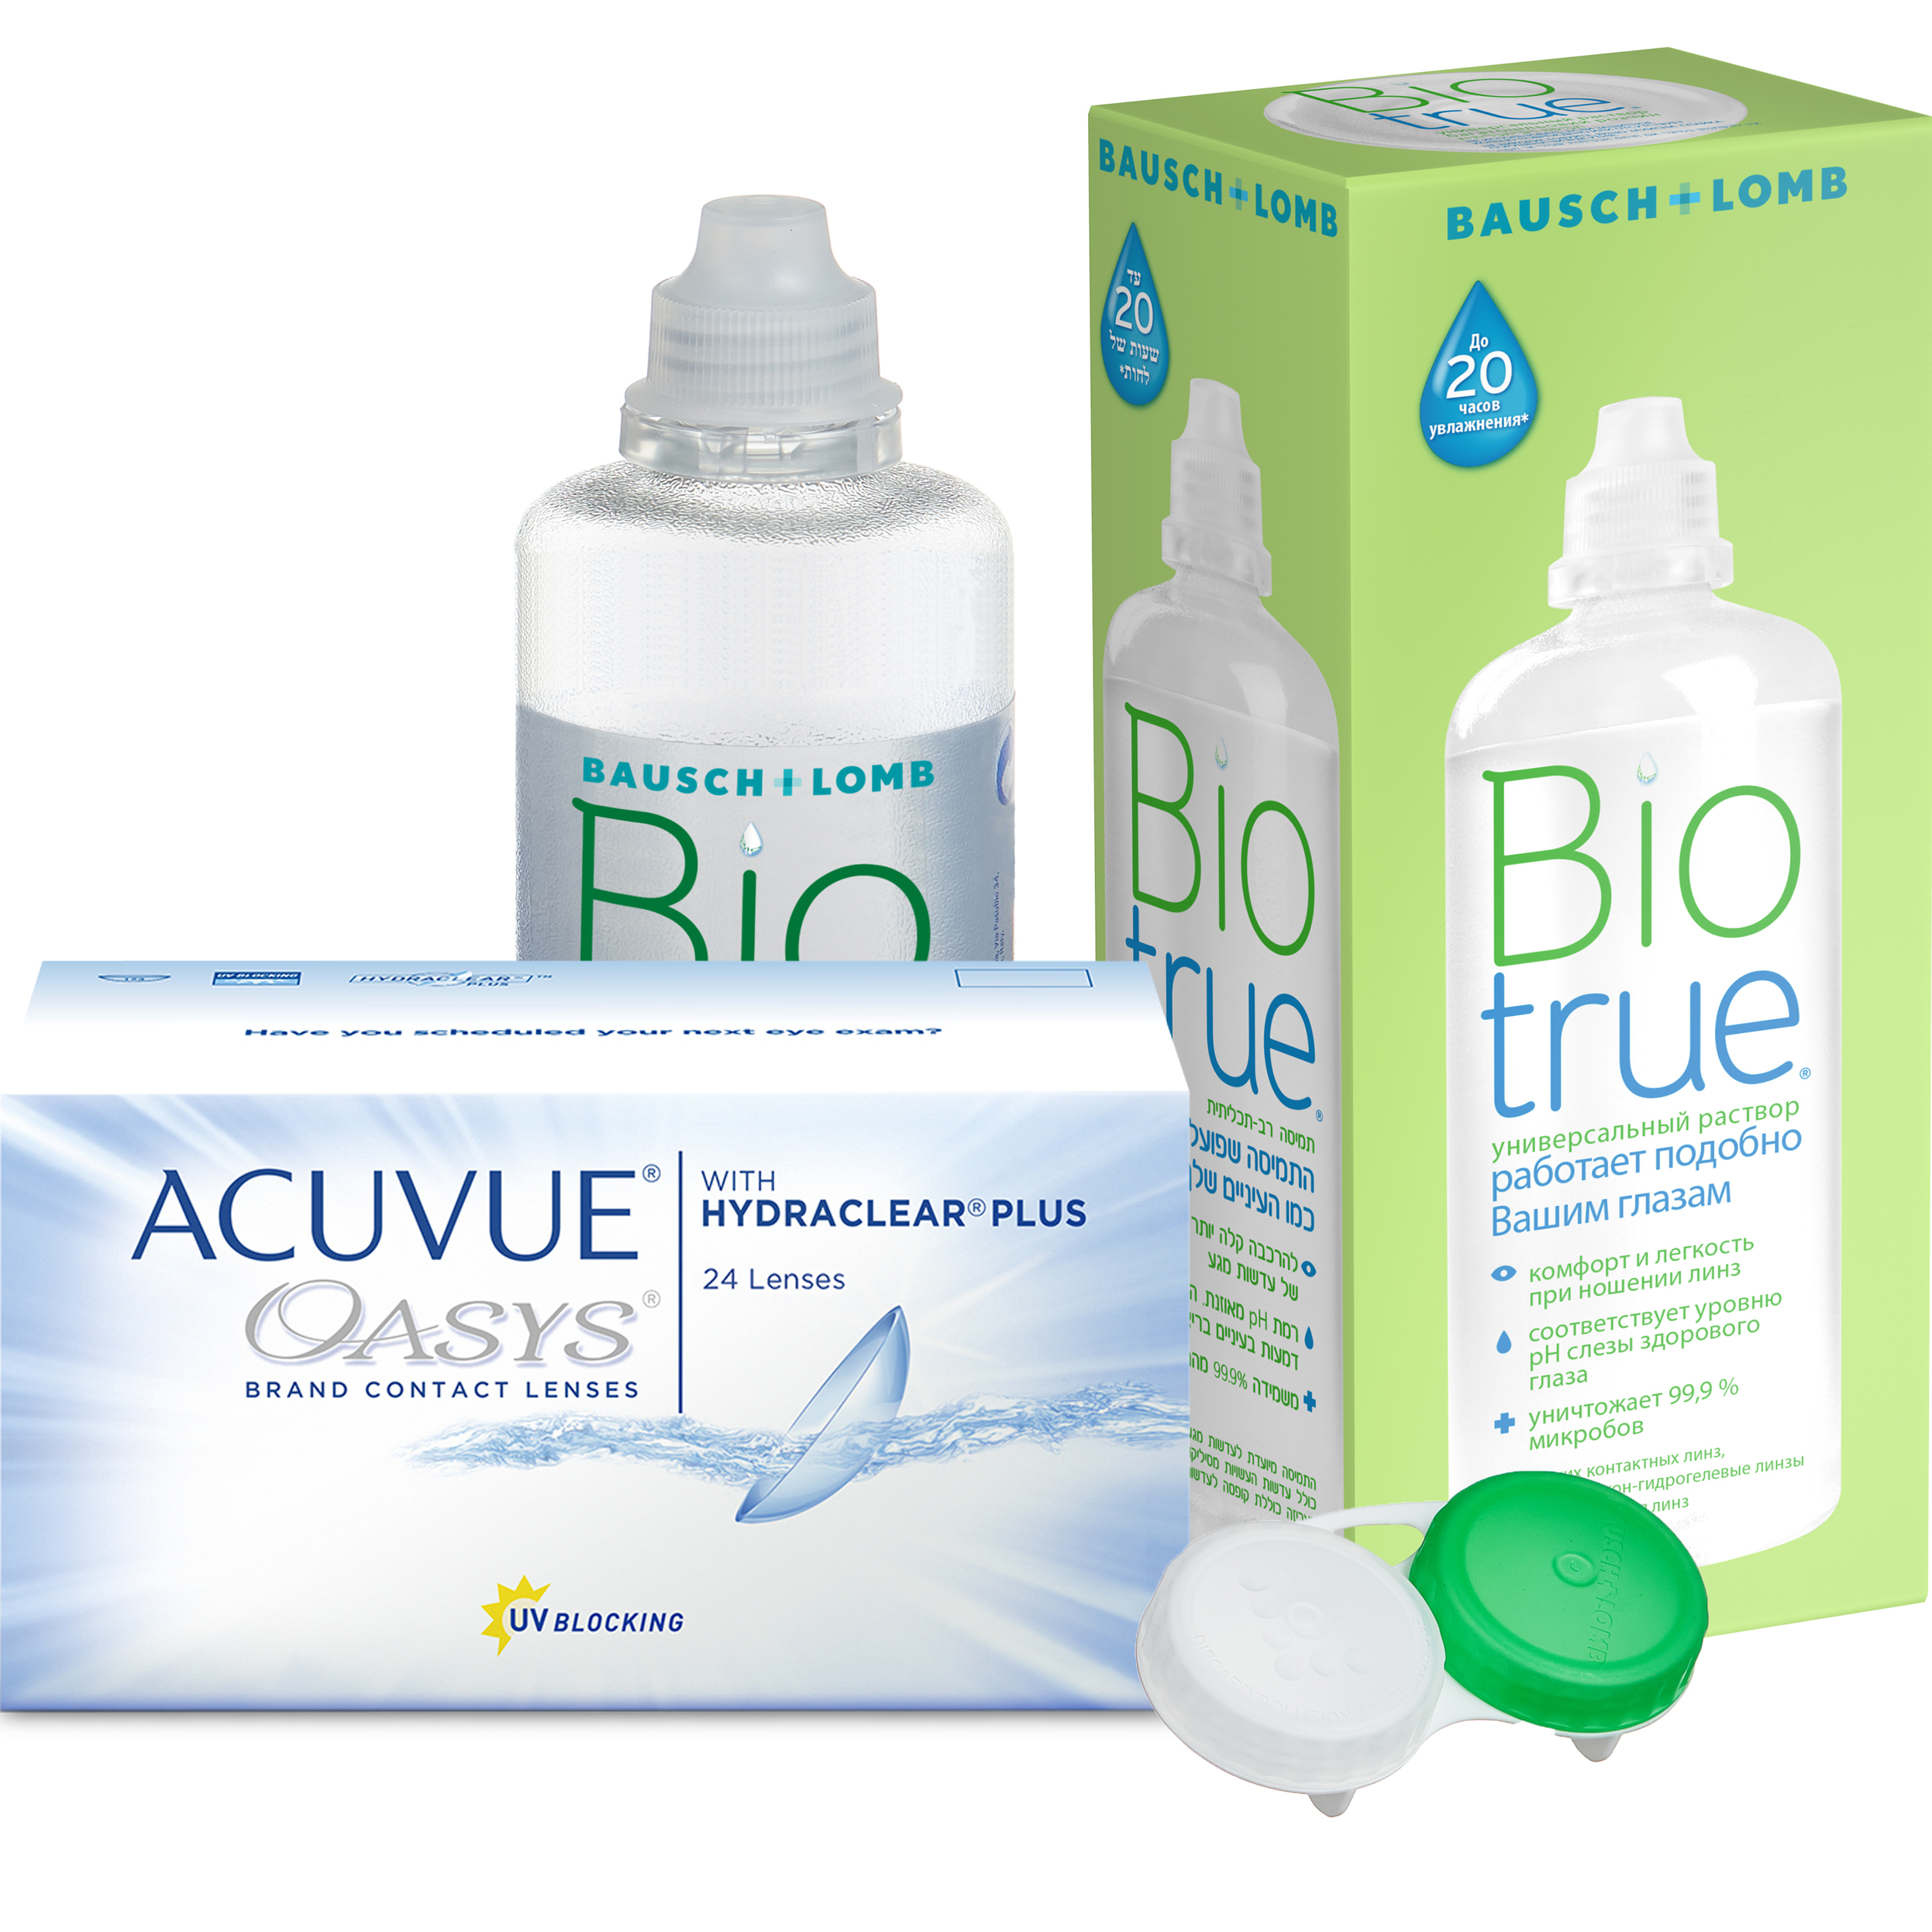 Купить Oasys with Hydraclear Plus 24 линзы + Biotrue, Контактные линзы Acuvue Oasys with Hydraclear Plus 24 линзы R 8.4 -1, 75 + Biotrue 300 мл